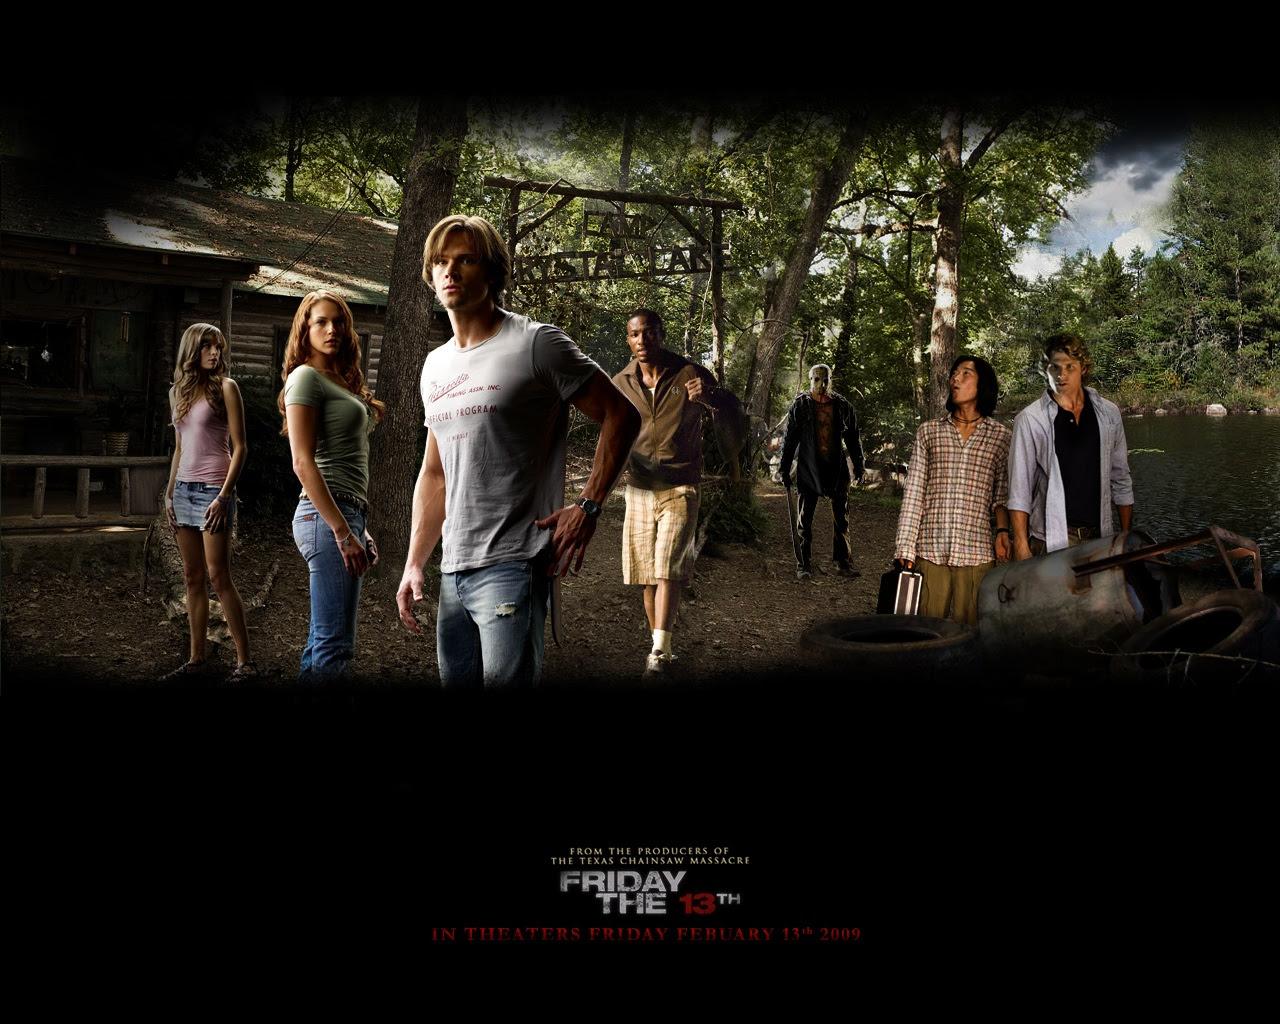 Friday The 13th 2009 Jason Voorhees Wallpaper 25606981 Fanpop